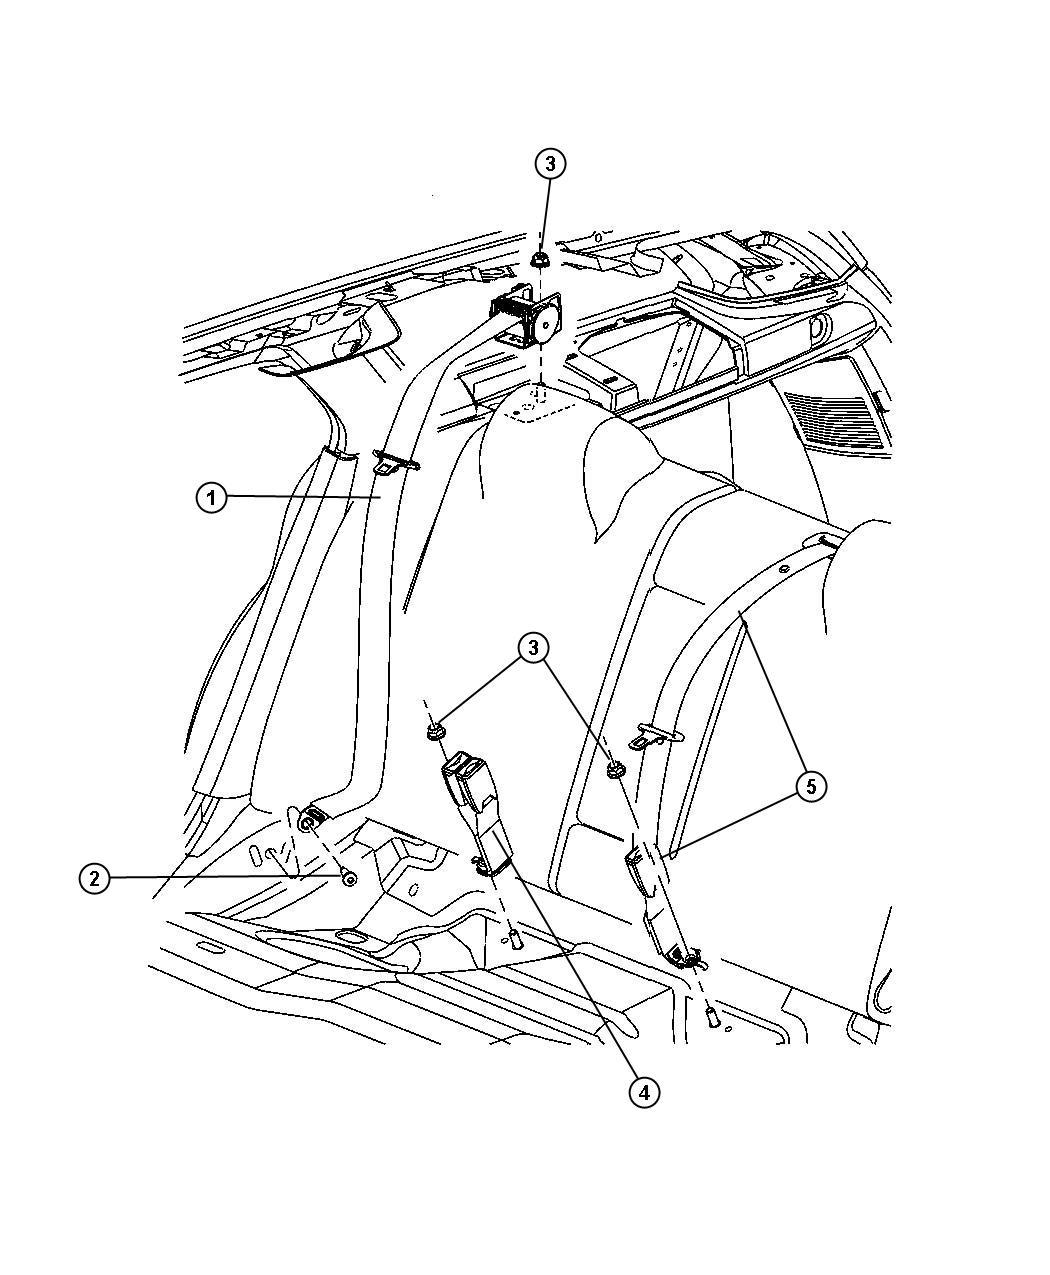 Dodge Magnum Seat Belt Rear D1 J1 Trim Leather